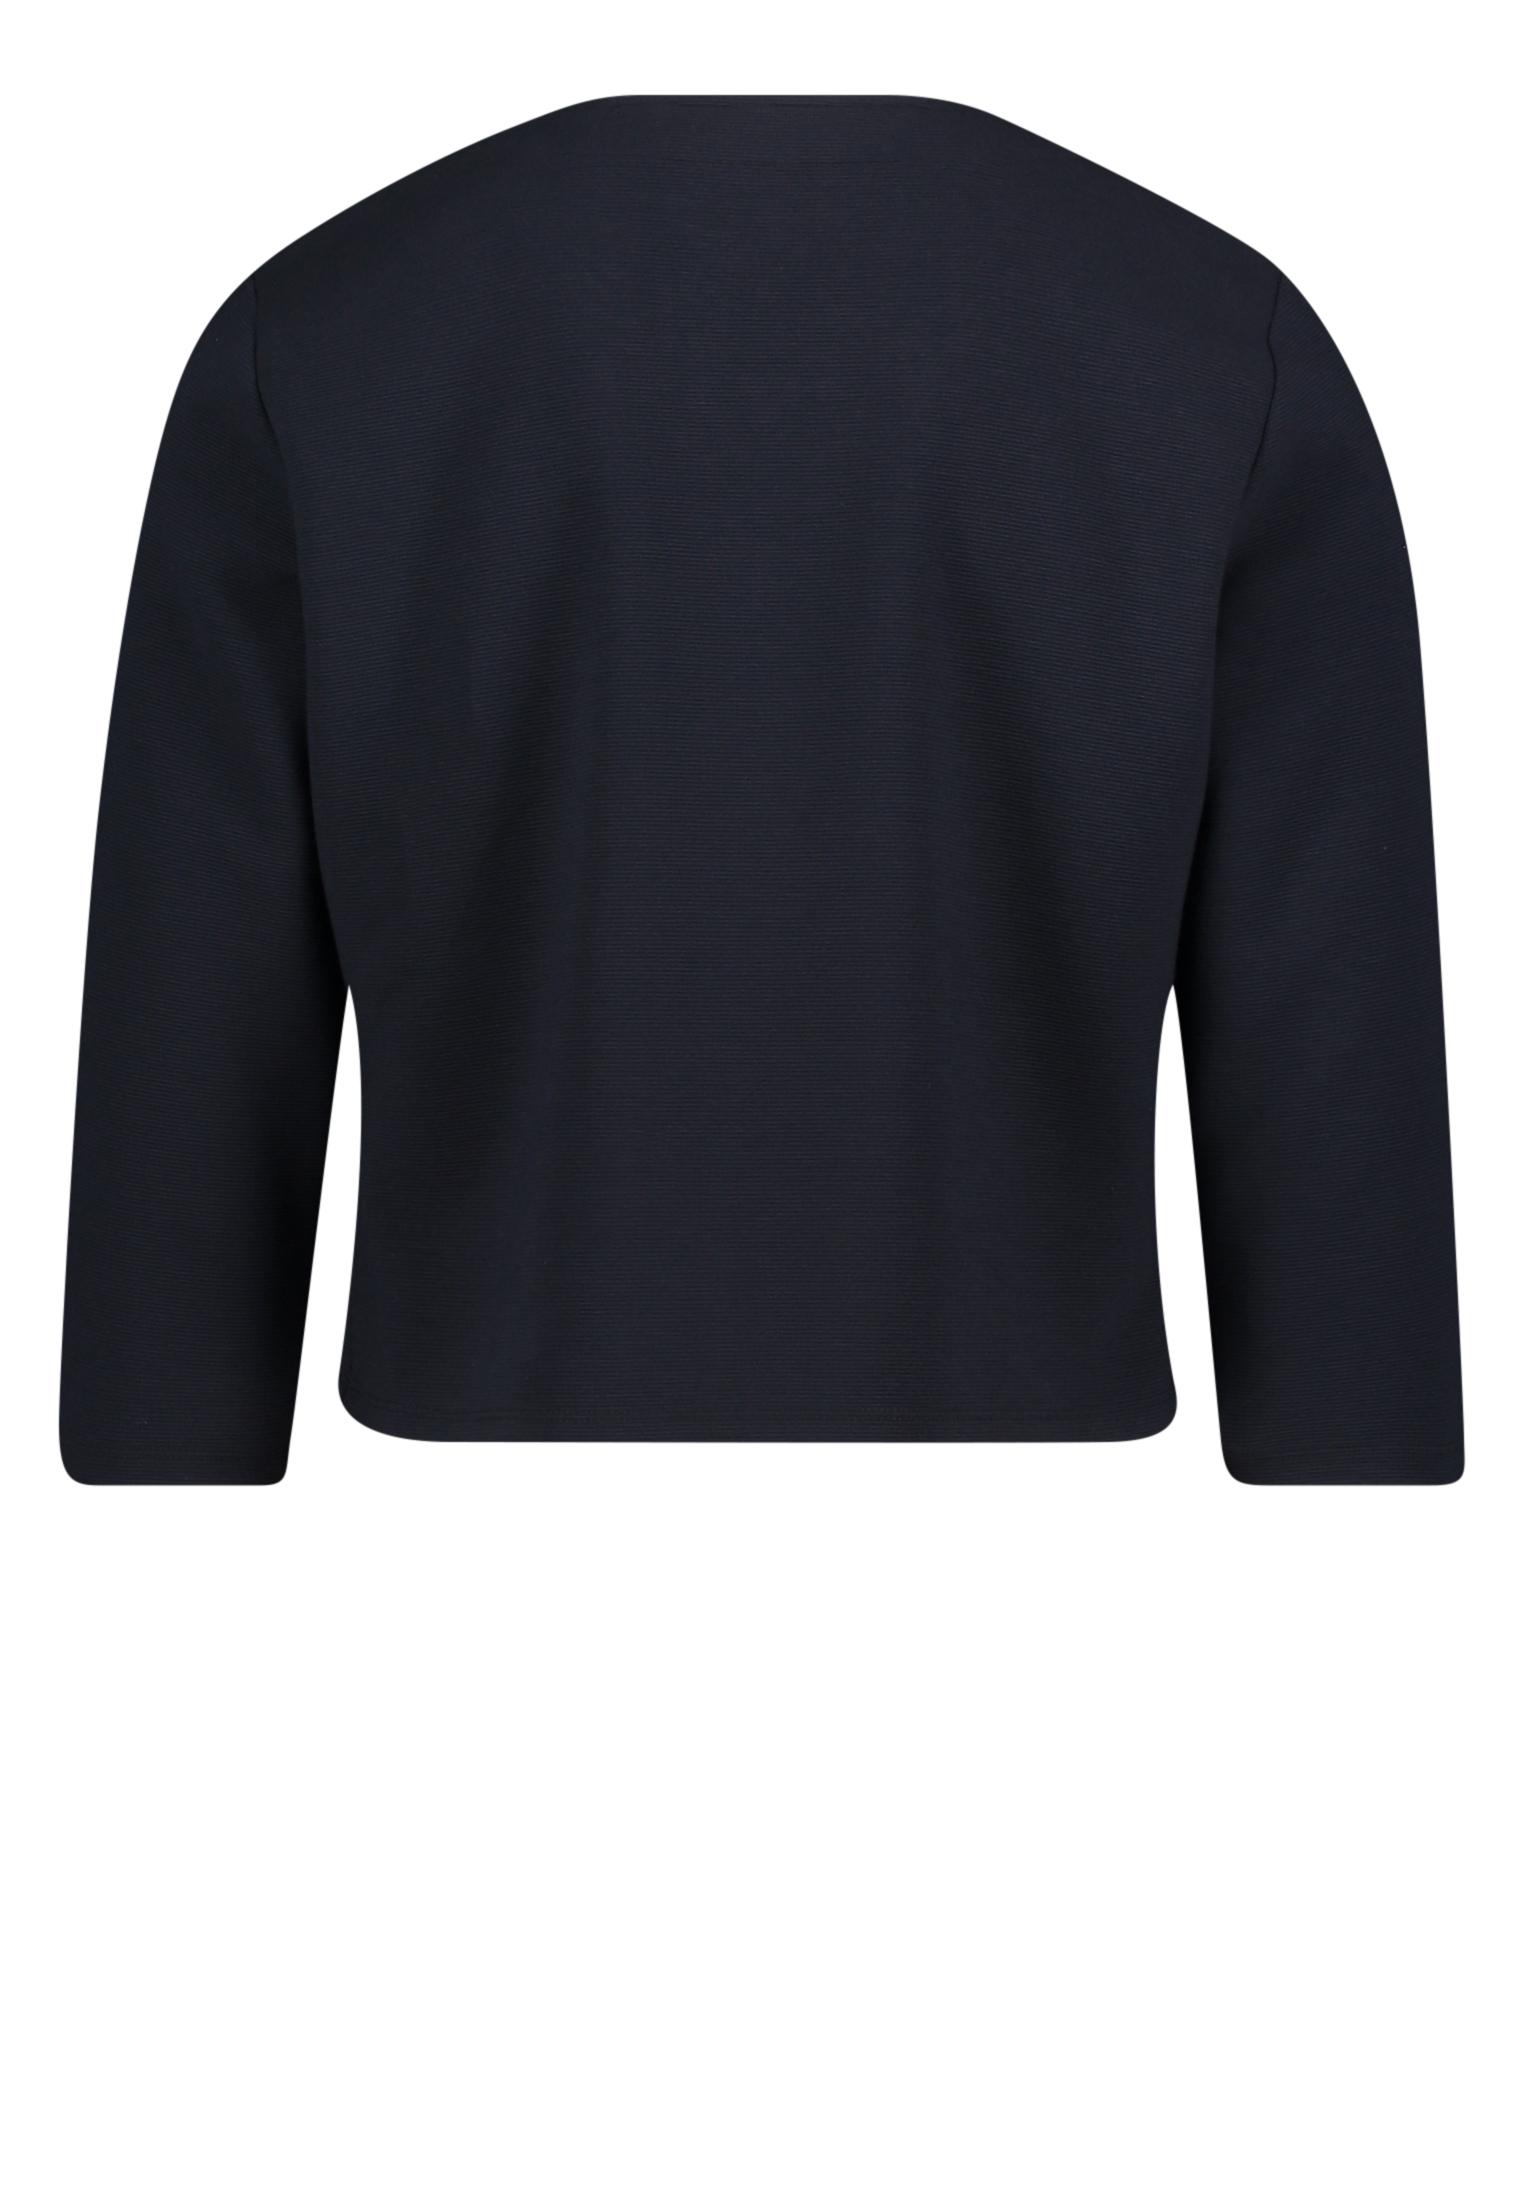 Shirt Jacke Kurz 3/4 Arm